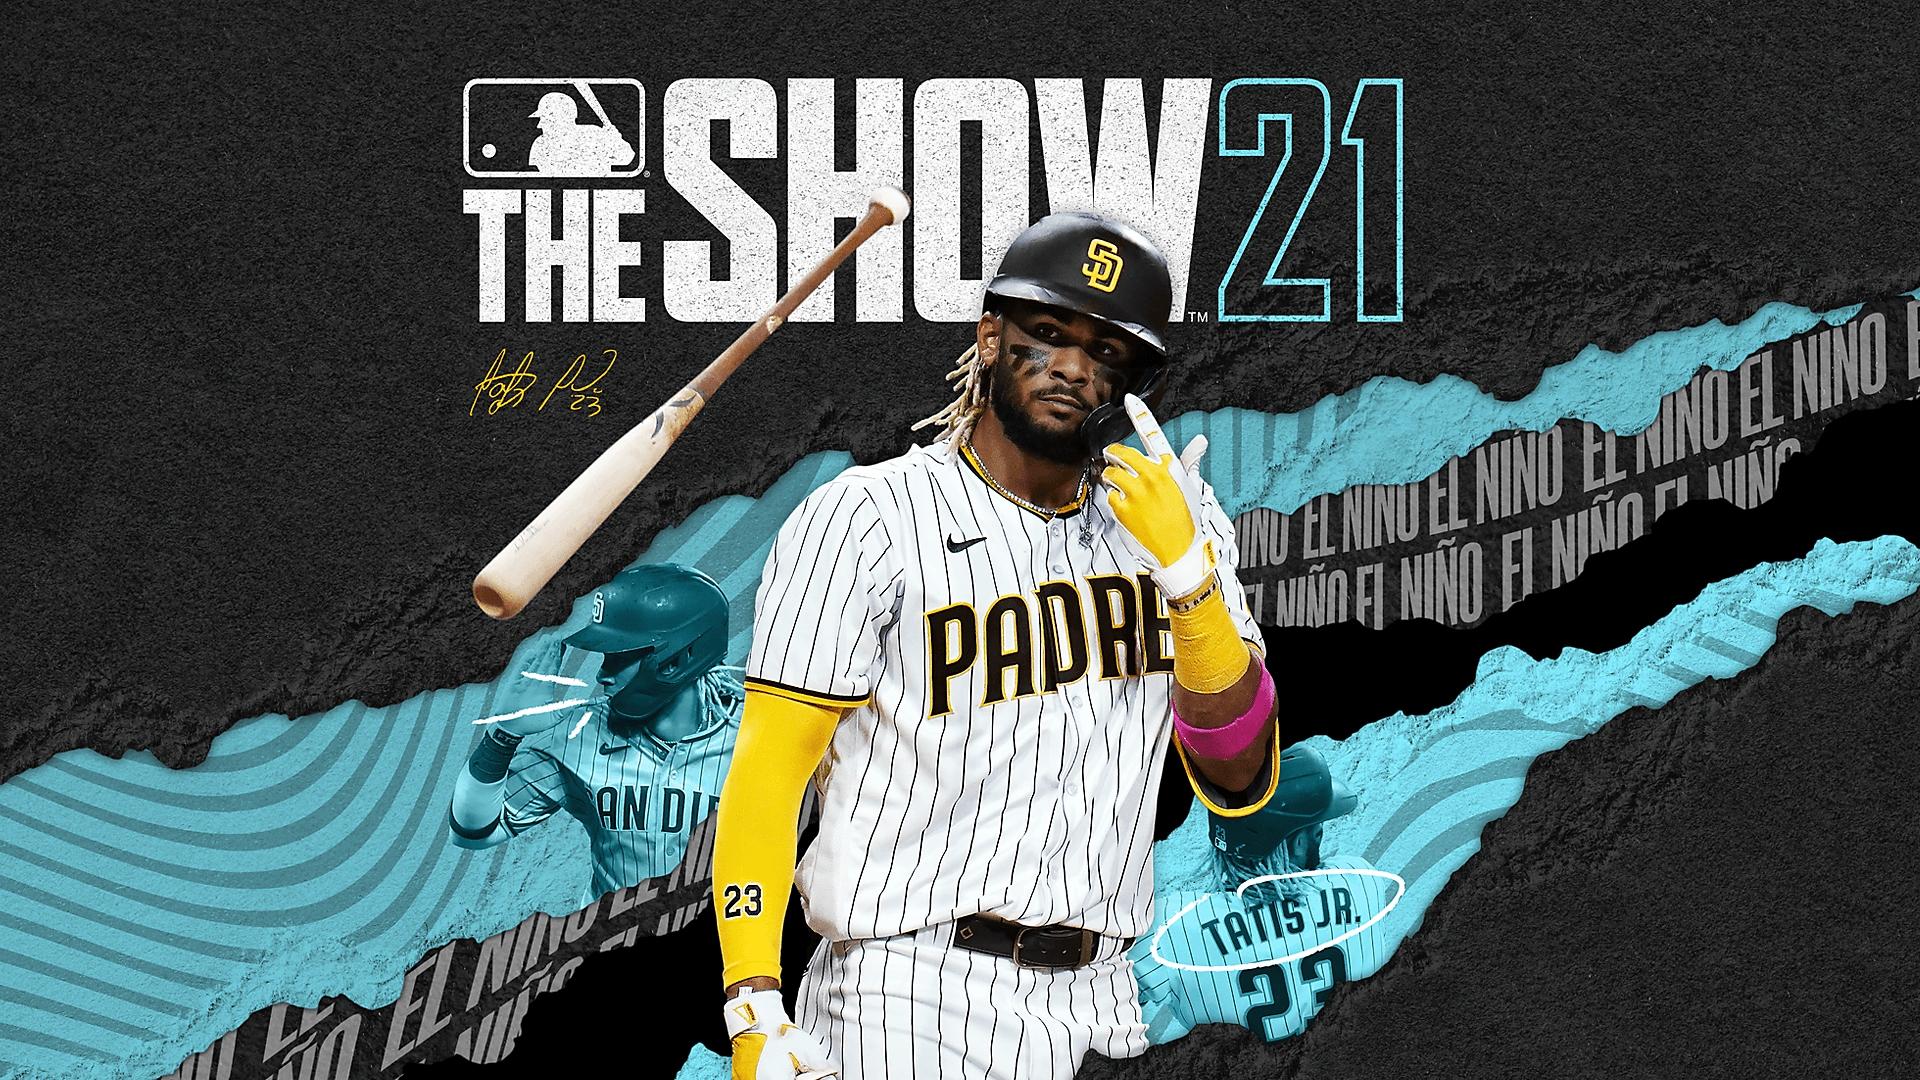 MLB: The Show 21 key art